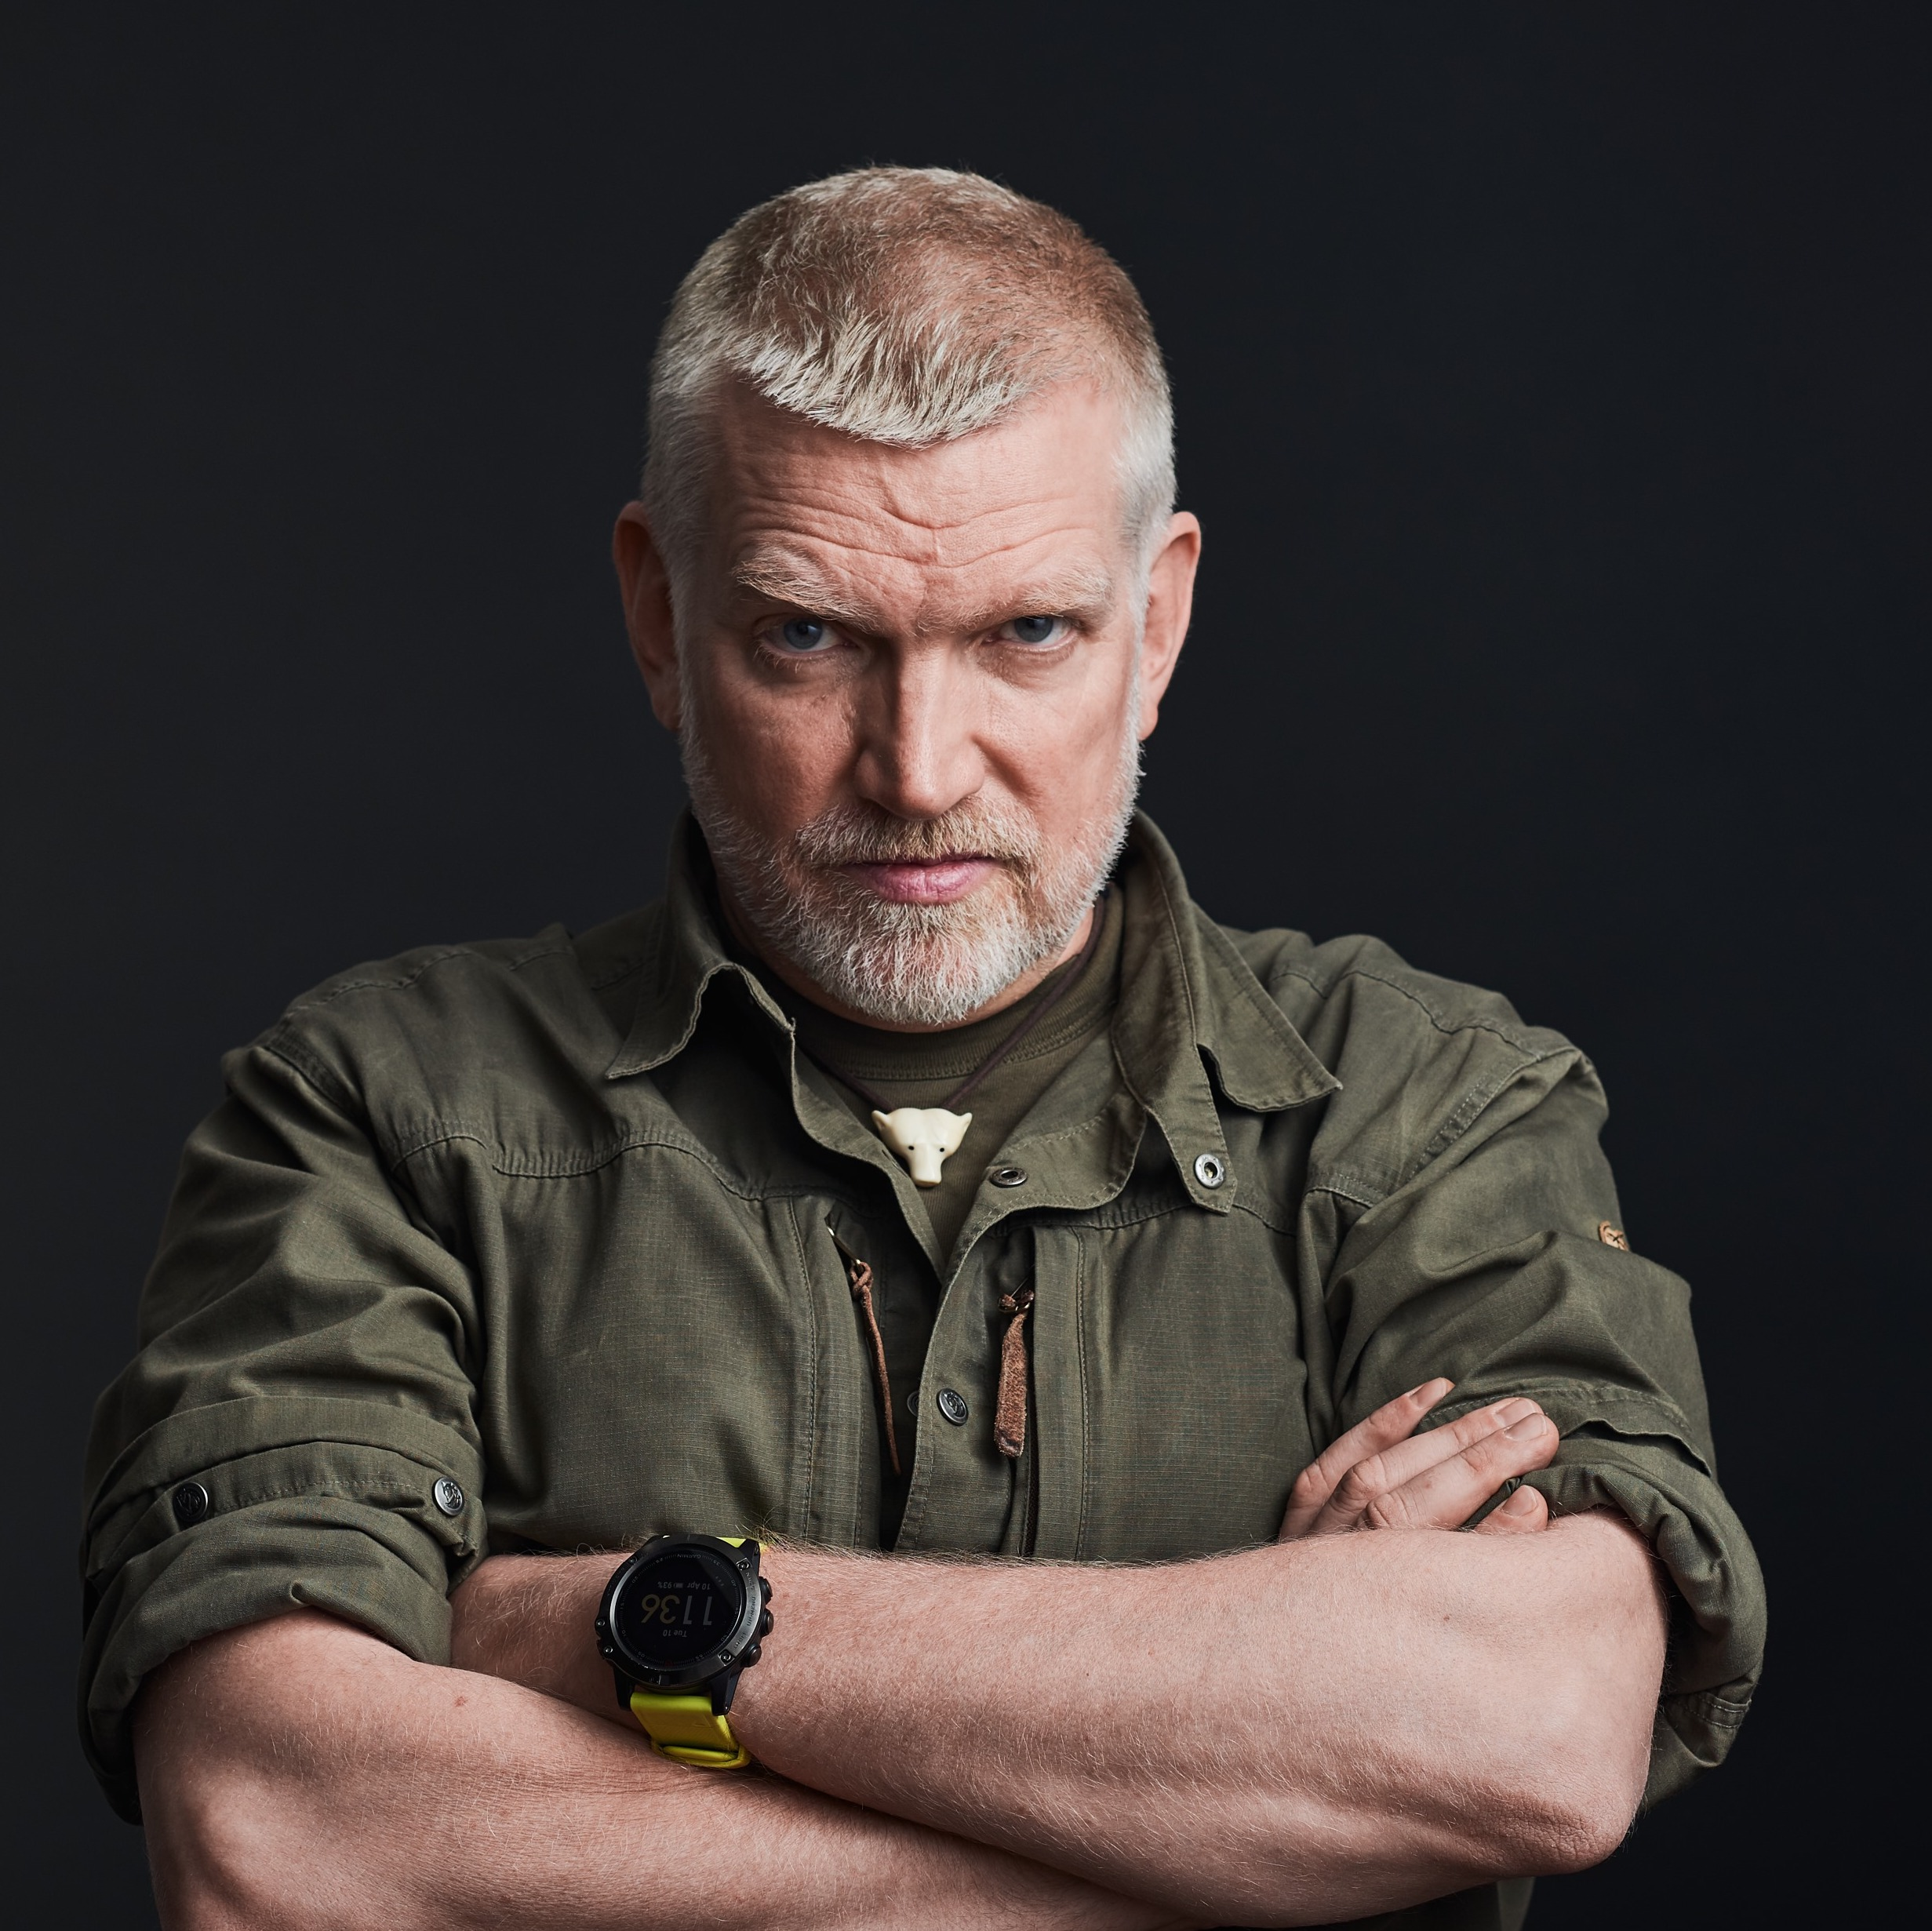 Patrick Degermann